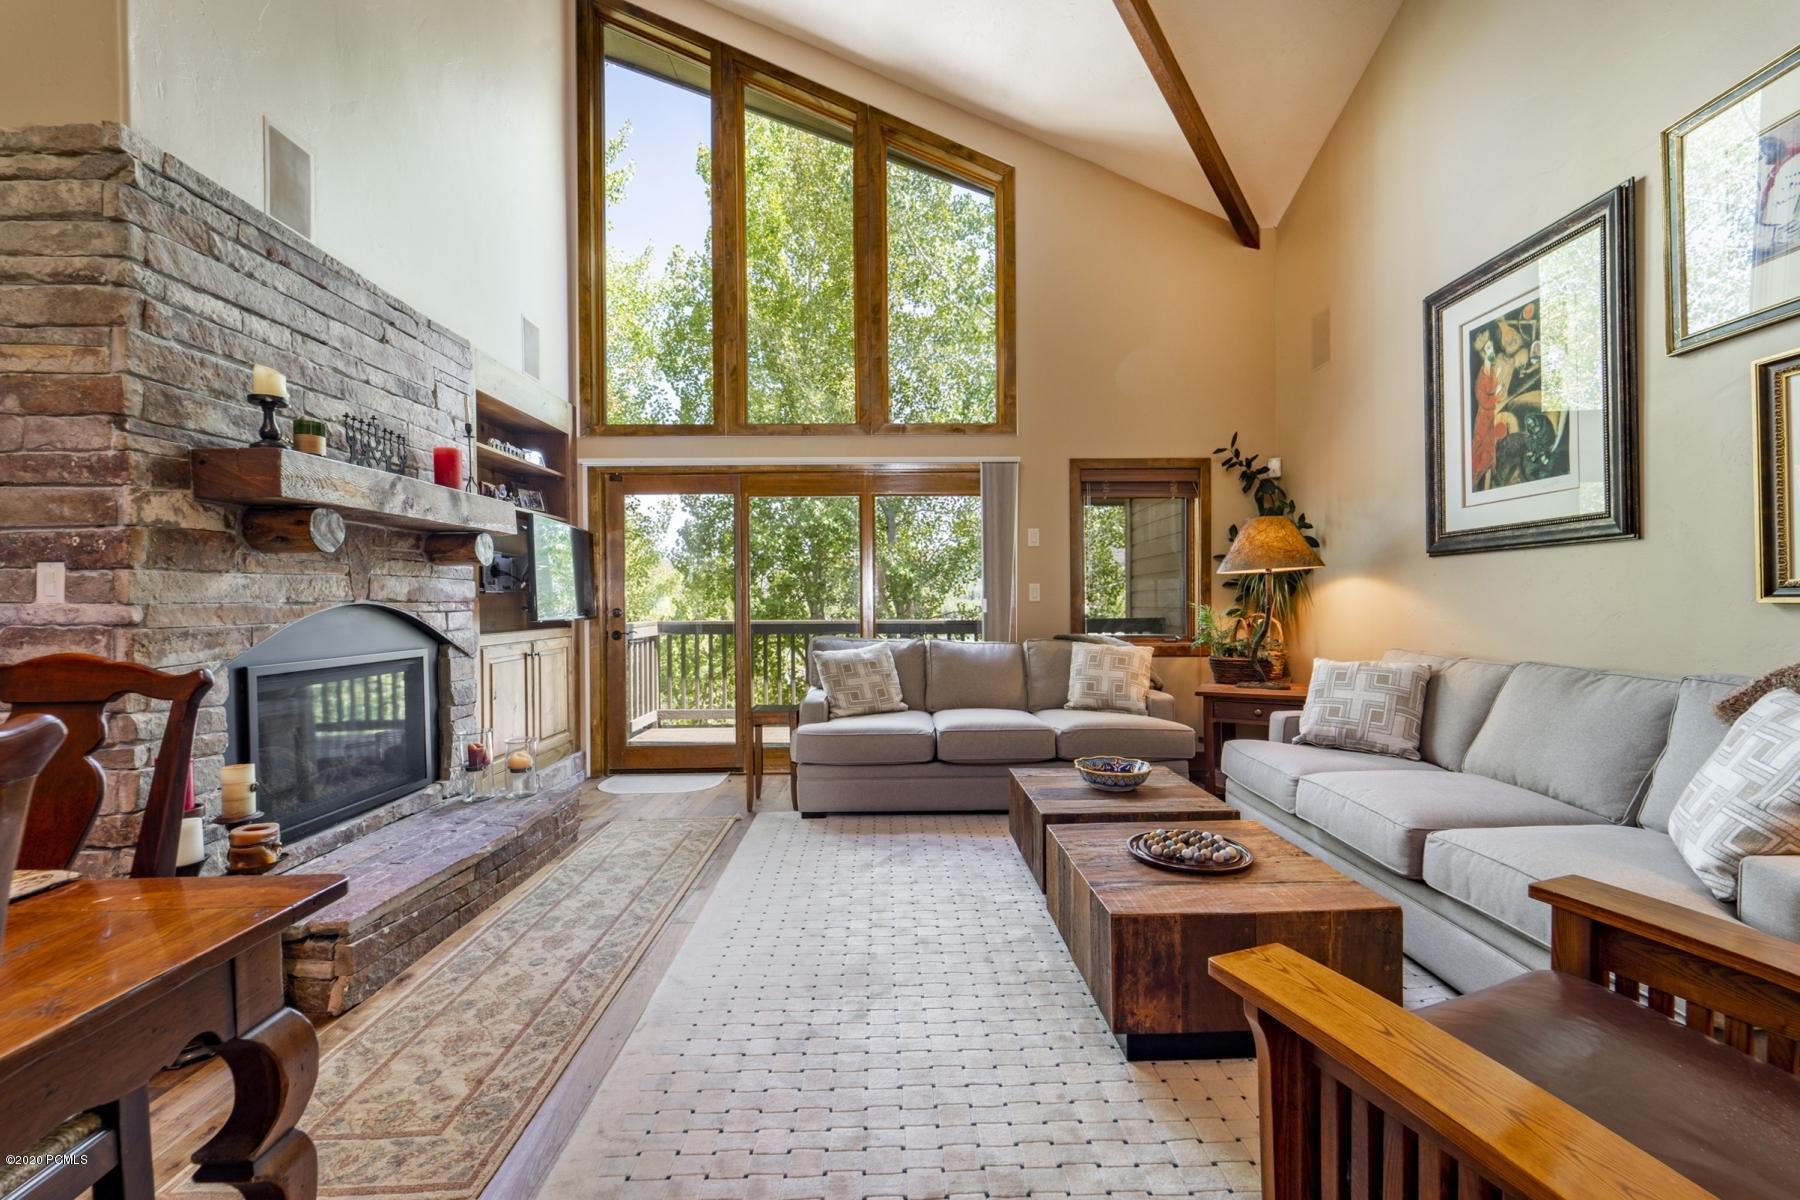 1510 Deer Valley Drive, Park City, Utah 84060, 3 Bedrooms Bedrooms, ,3 BathroomsBathrooms,Condominium,For Sale,Deer Valley,12003184